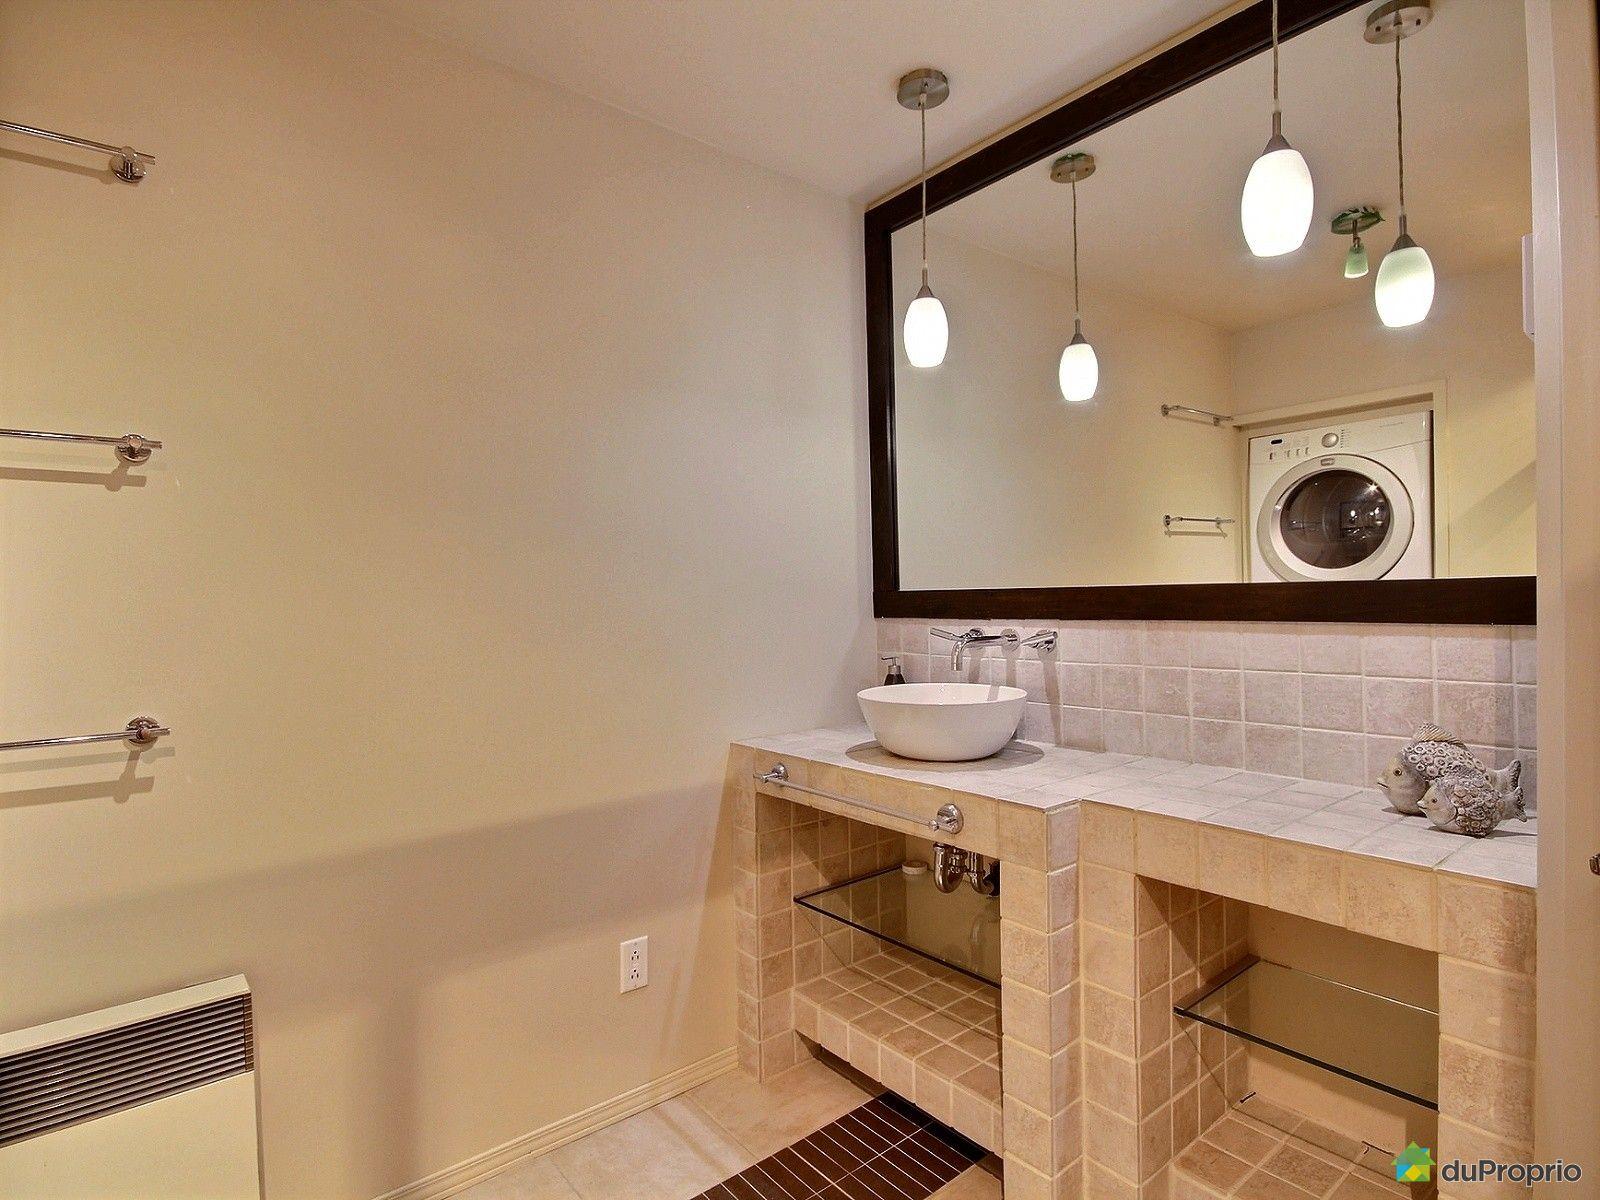 Maison vendre alma 175 rue lalibert immobilier qu bec for Reno salle de bain quebec